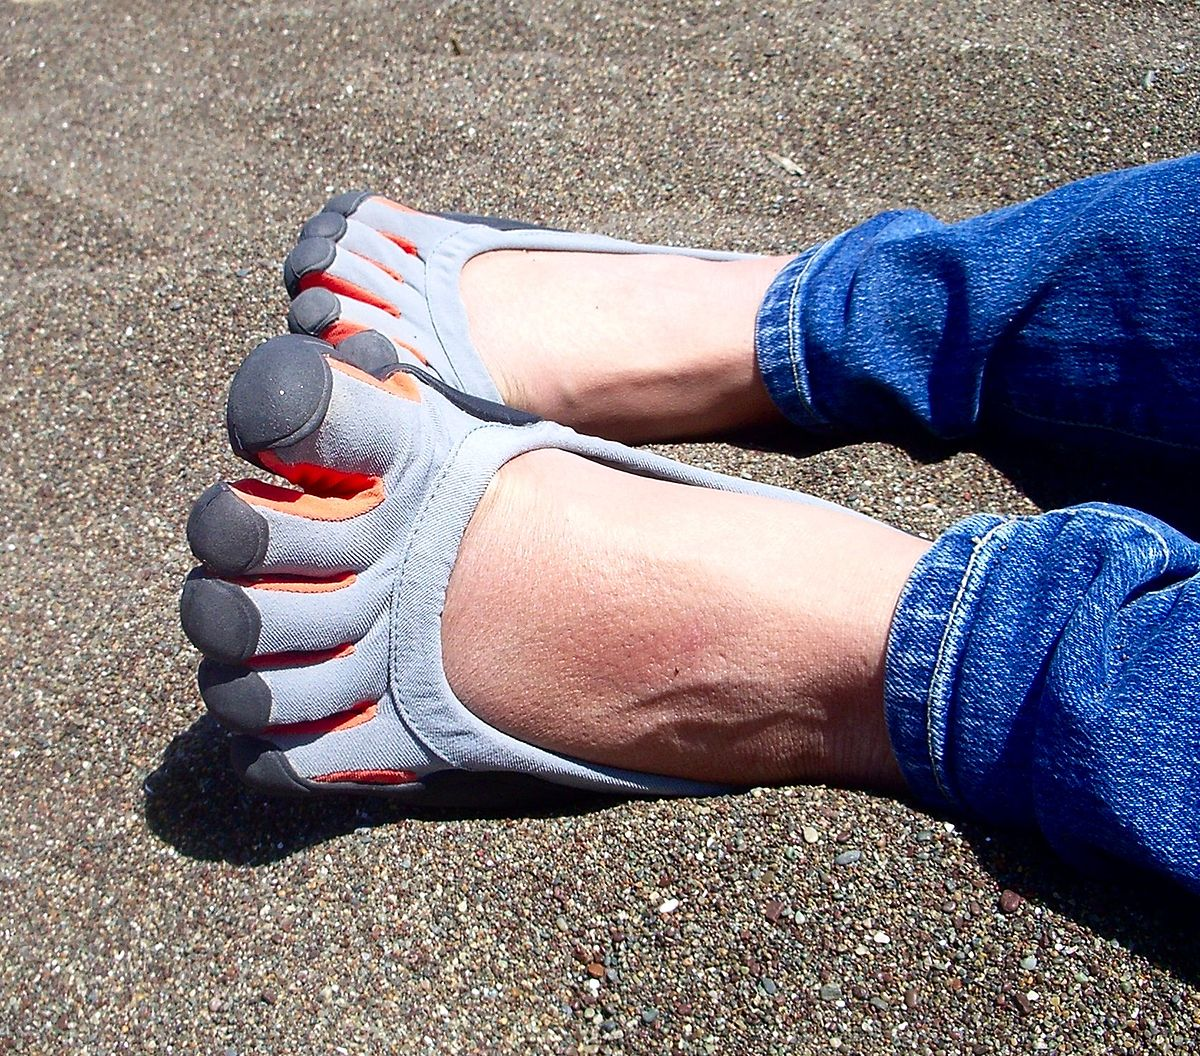 chaussure à orteils — wikipédia